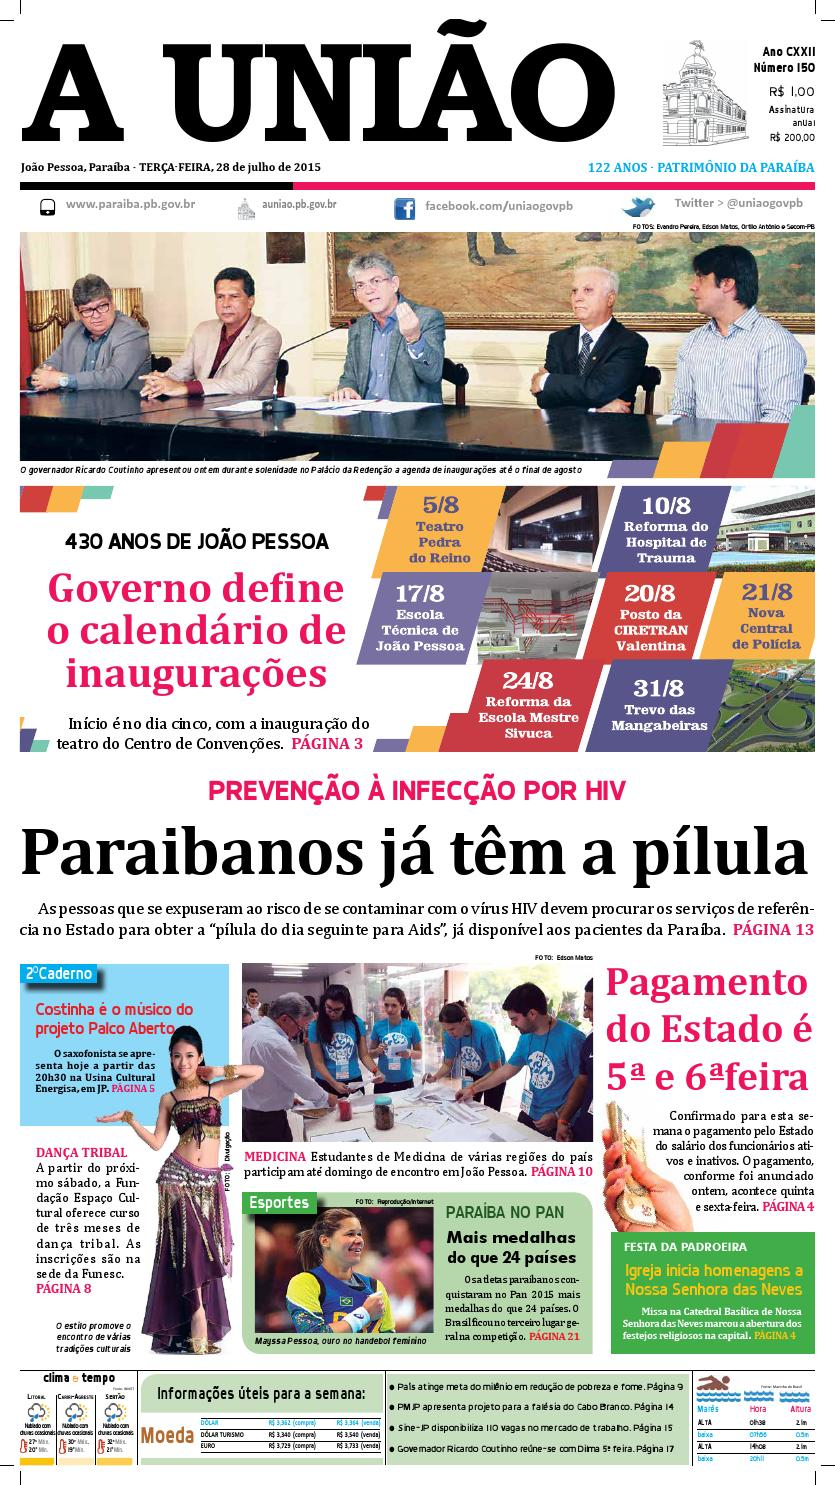 Jornal A União - 28 07 2015 by Jornal A União - issuu 271dd2276f